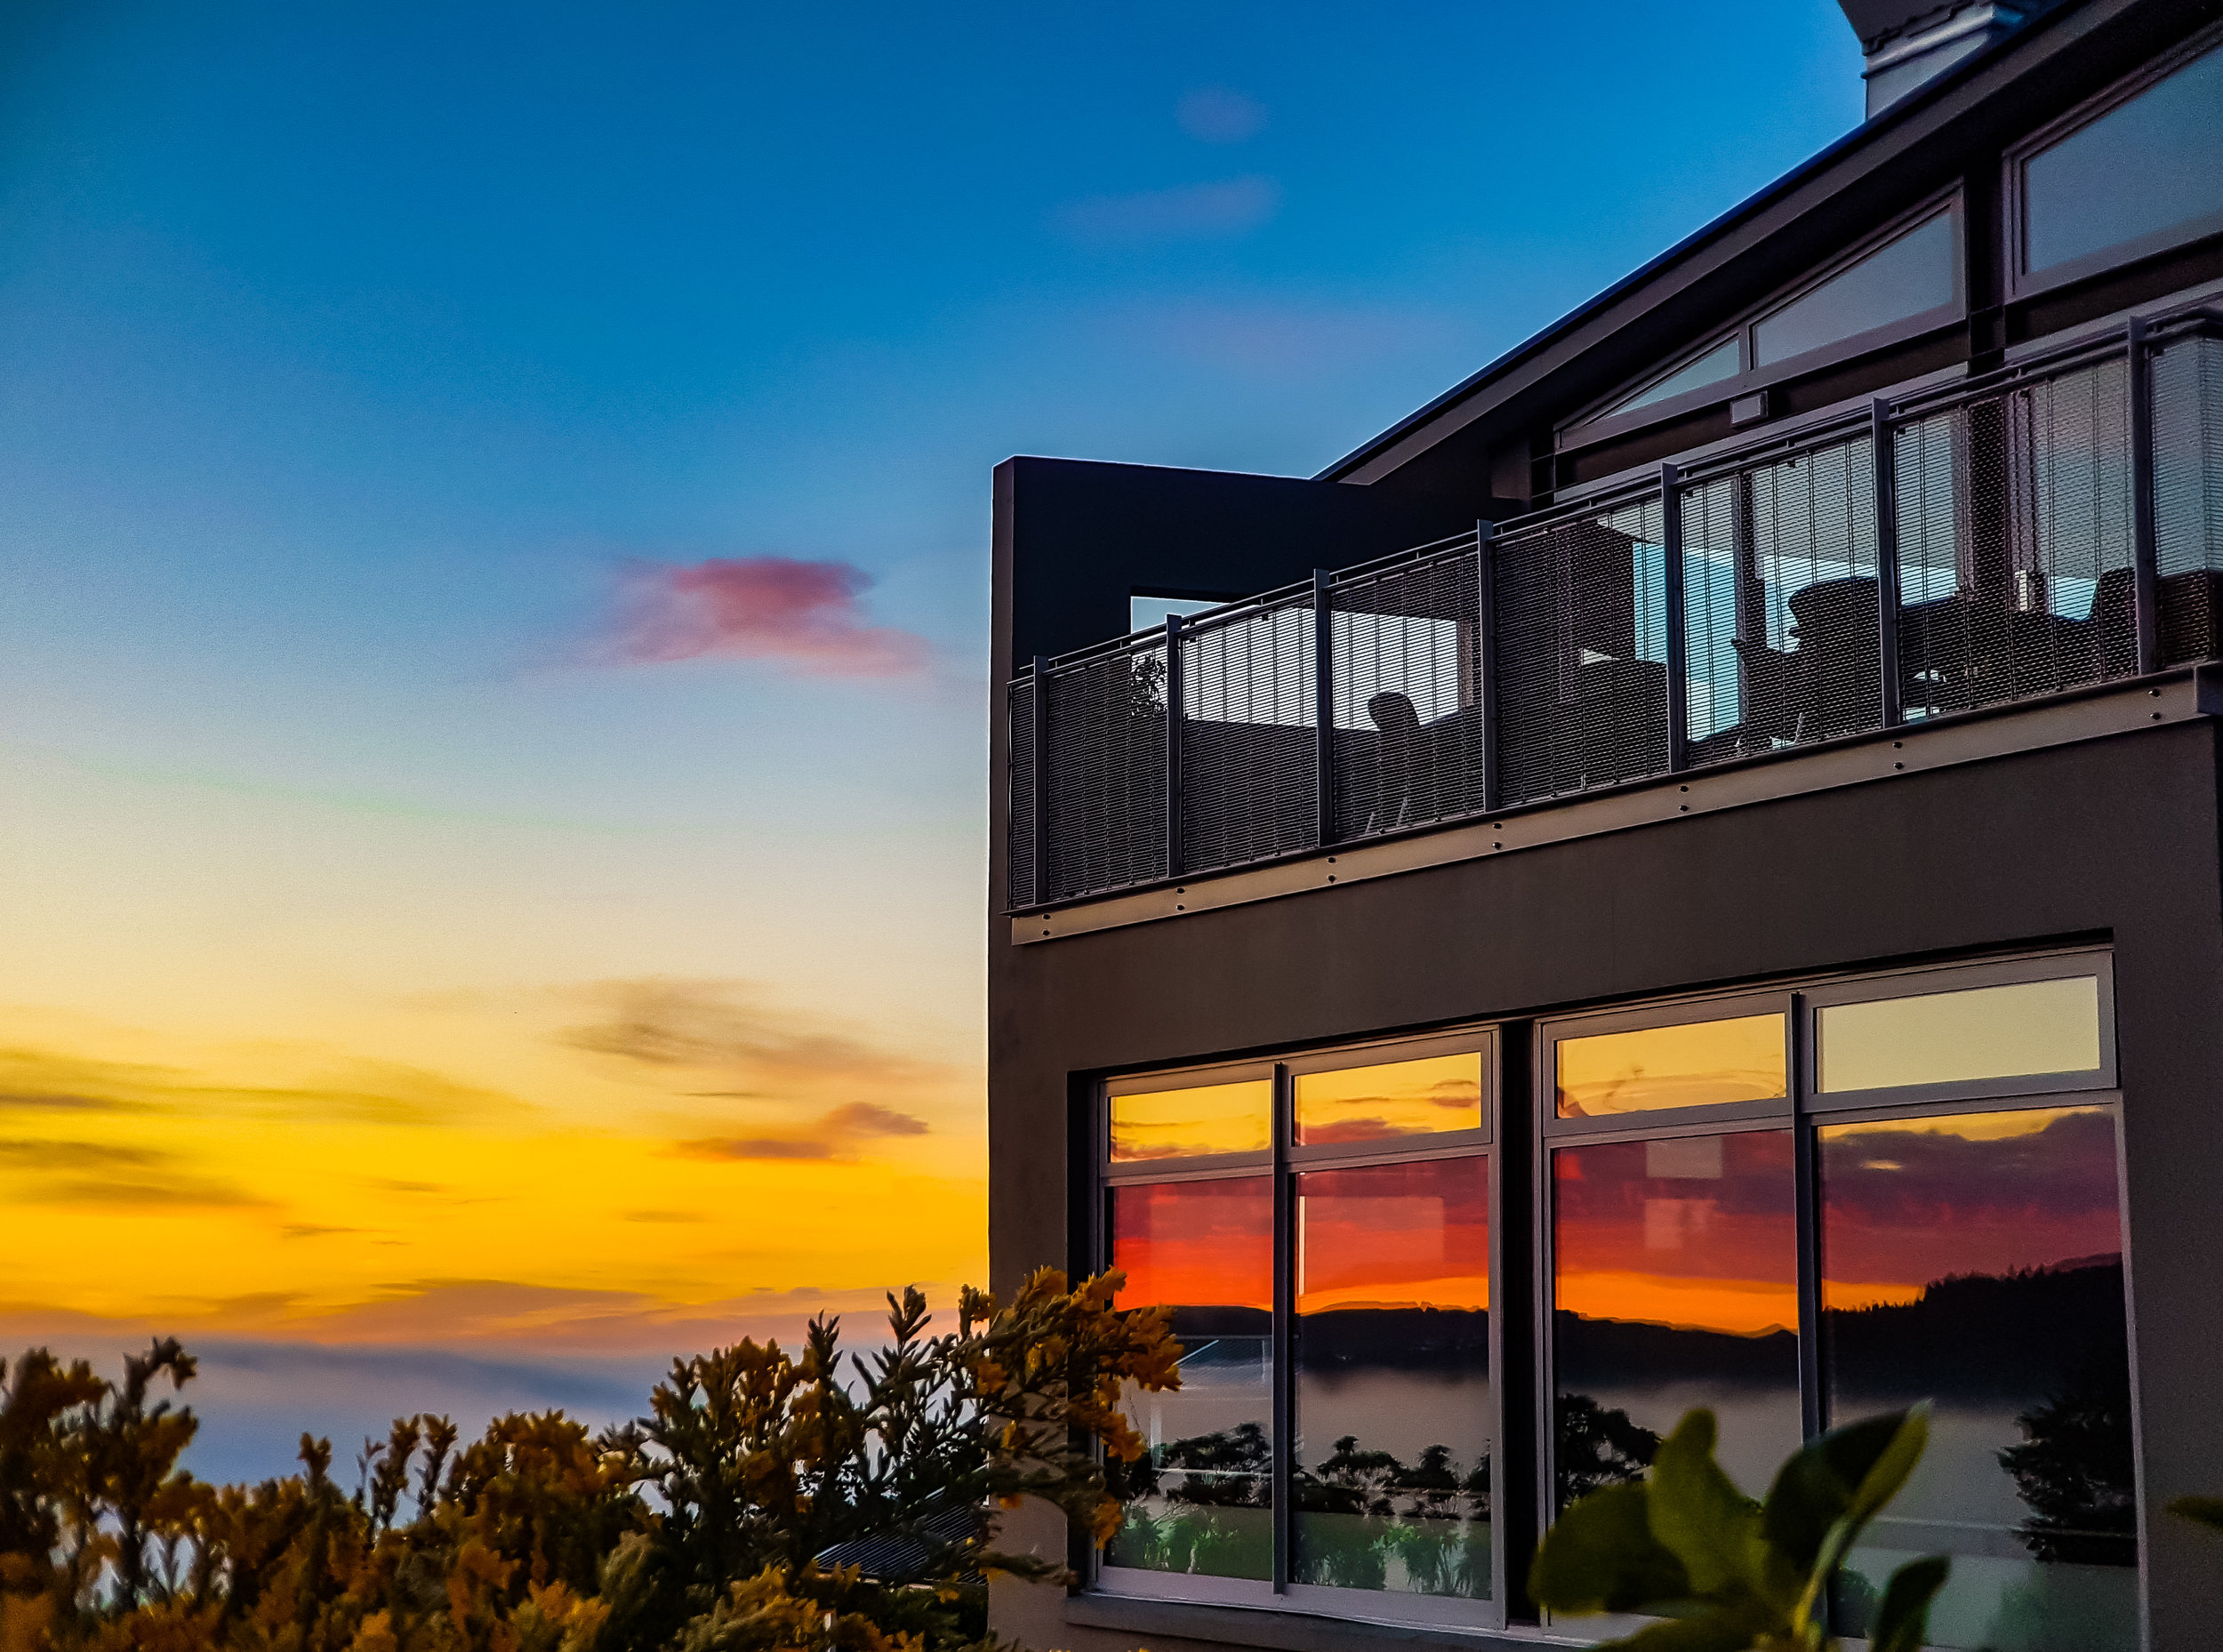 Sunrise reflection at Luna restaurant Dunedin